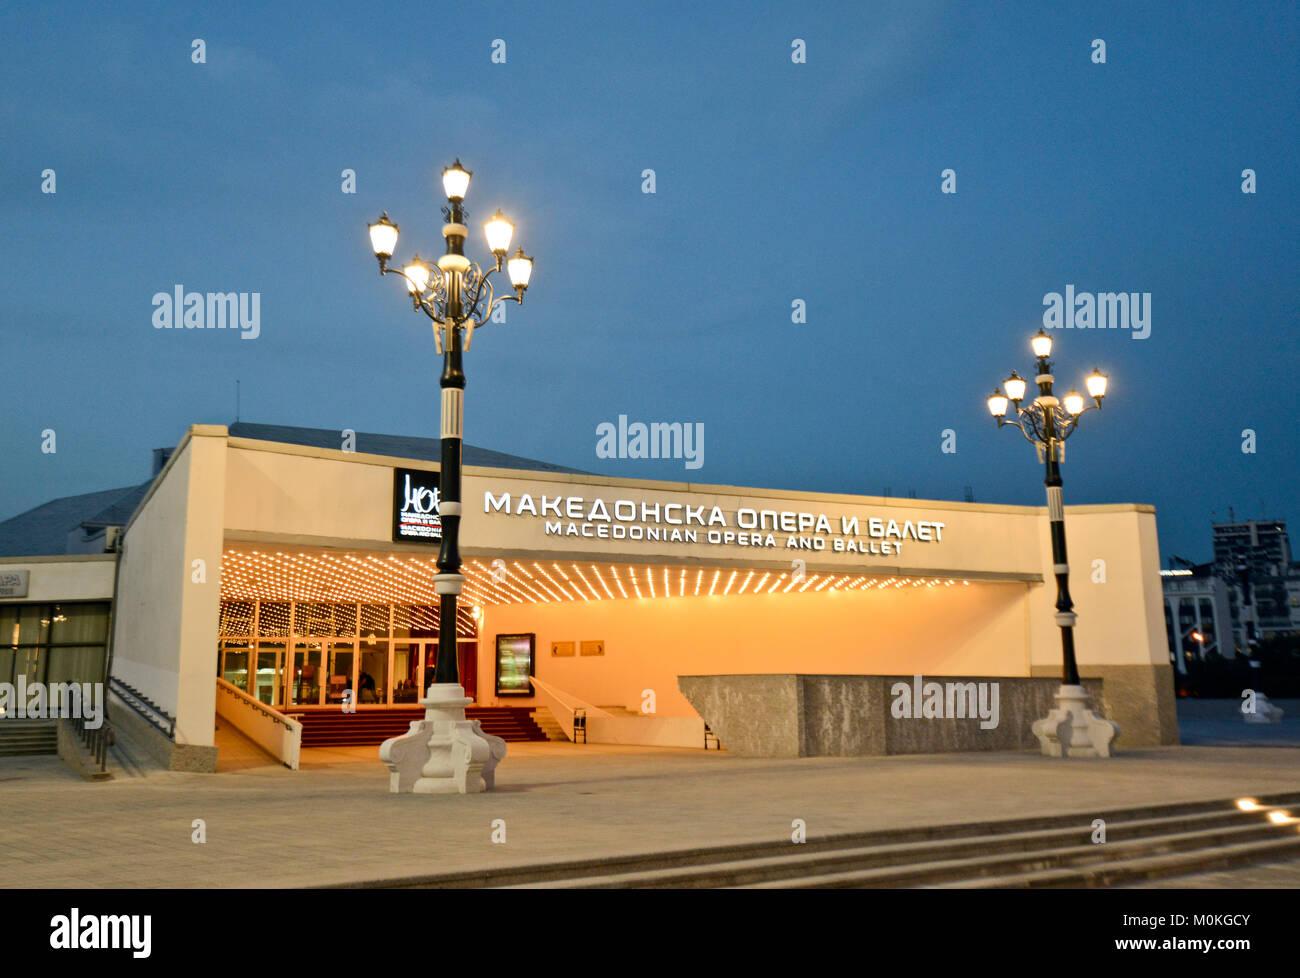 Macedonian opera and ballet, Skopje, Macedonia - Stock Image